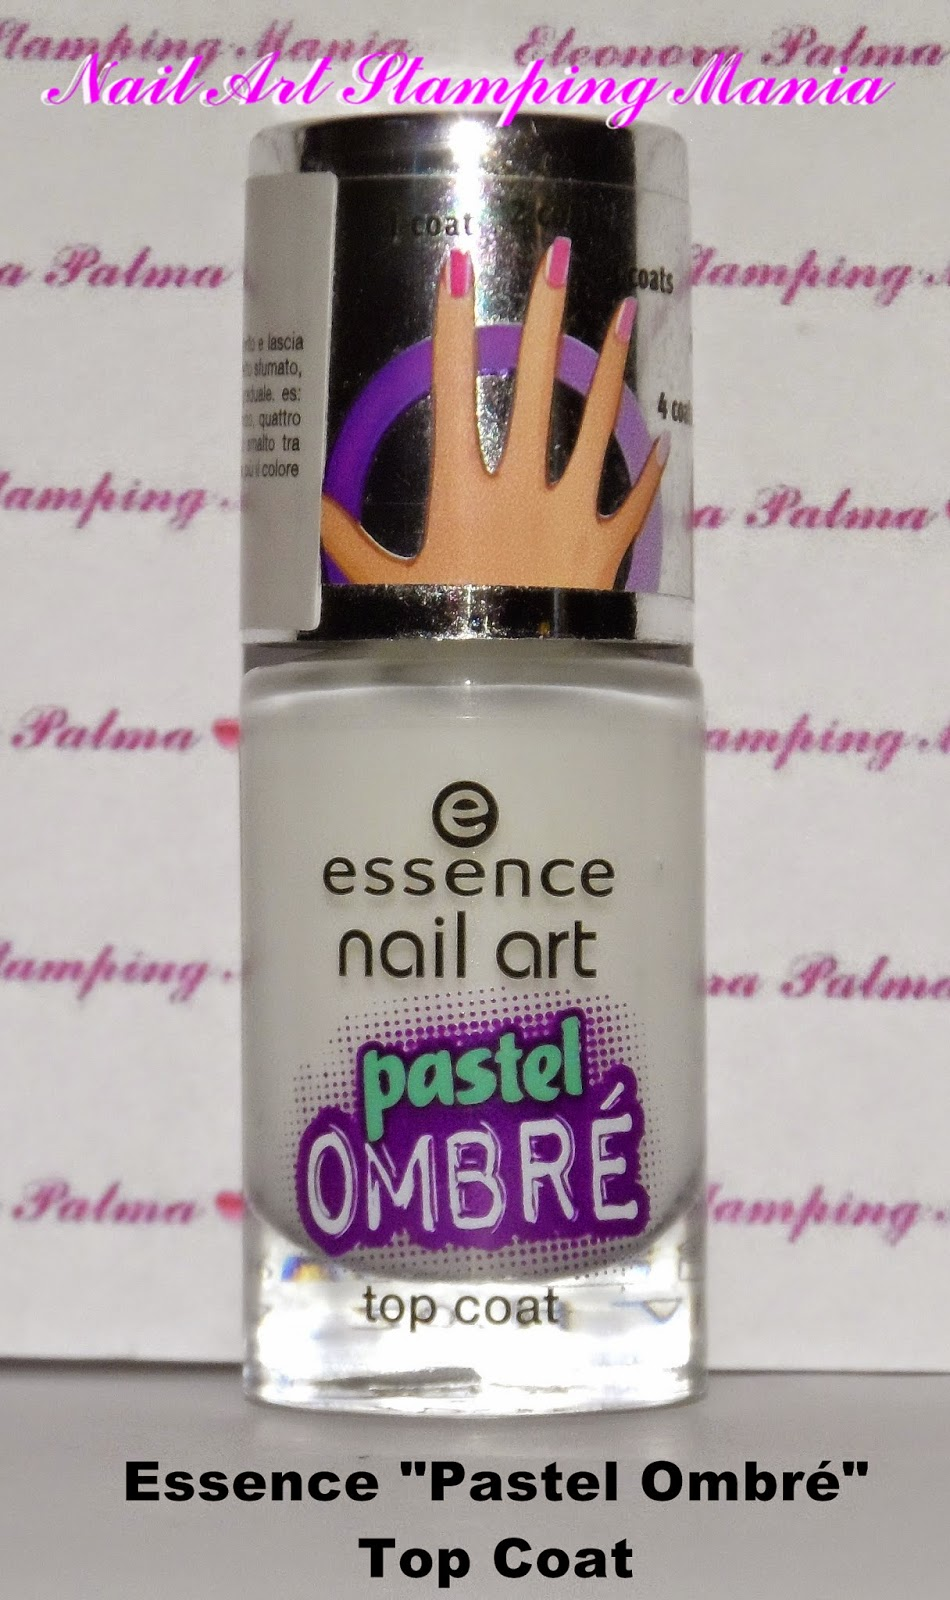 Nail Art Stamping Kit Nail Polish - To Bend Light